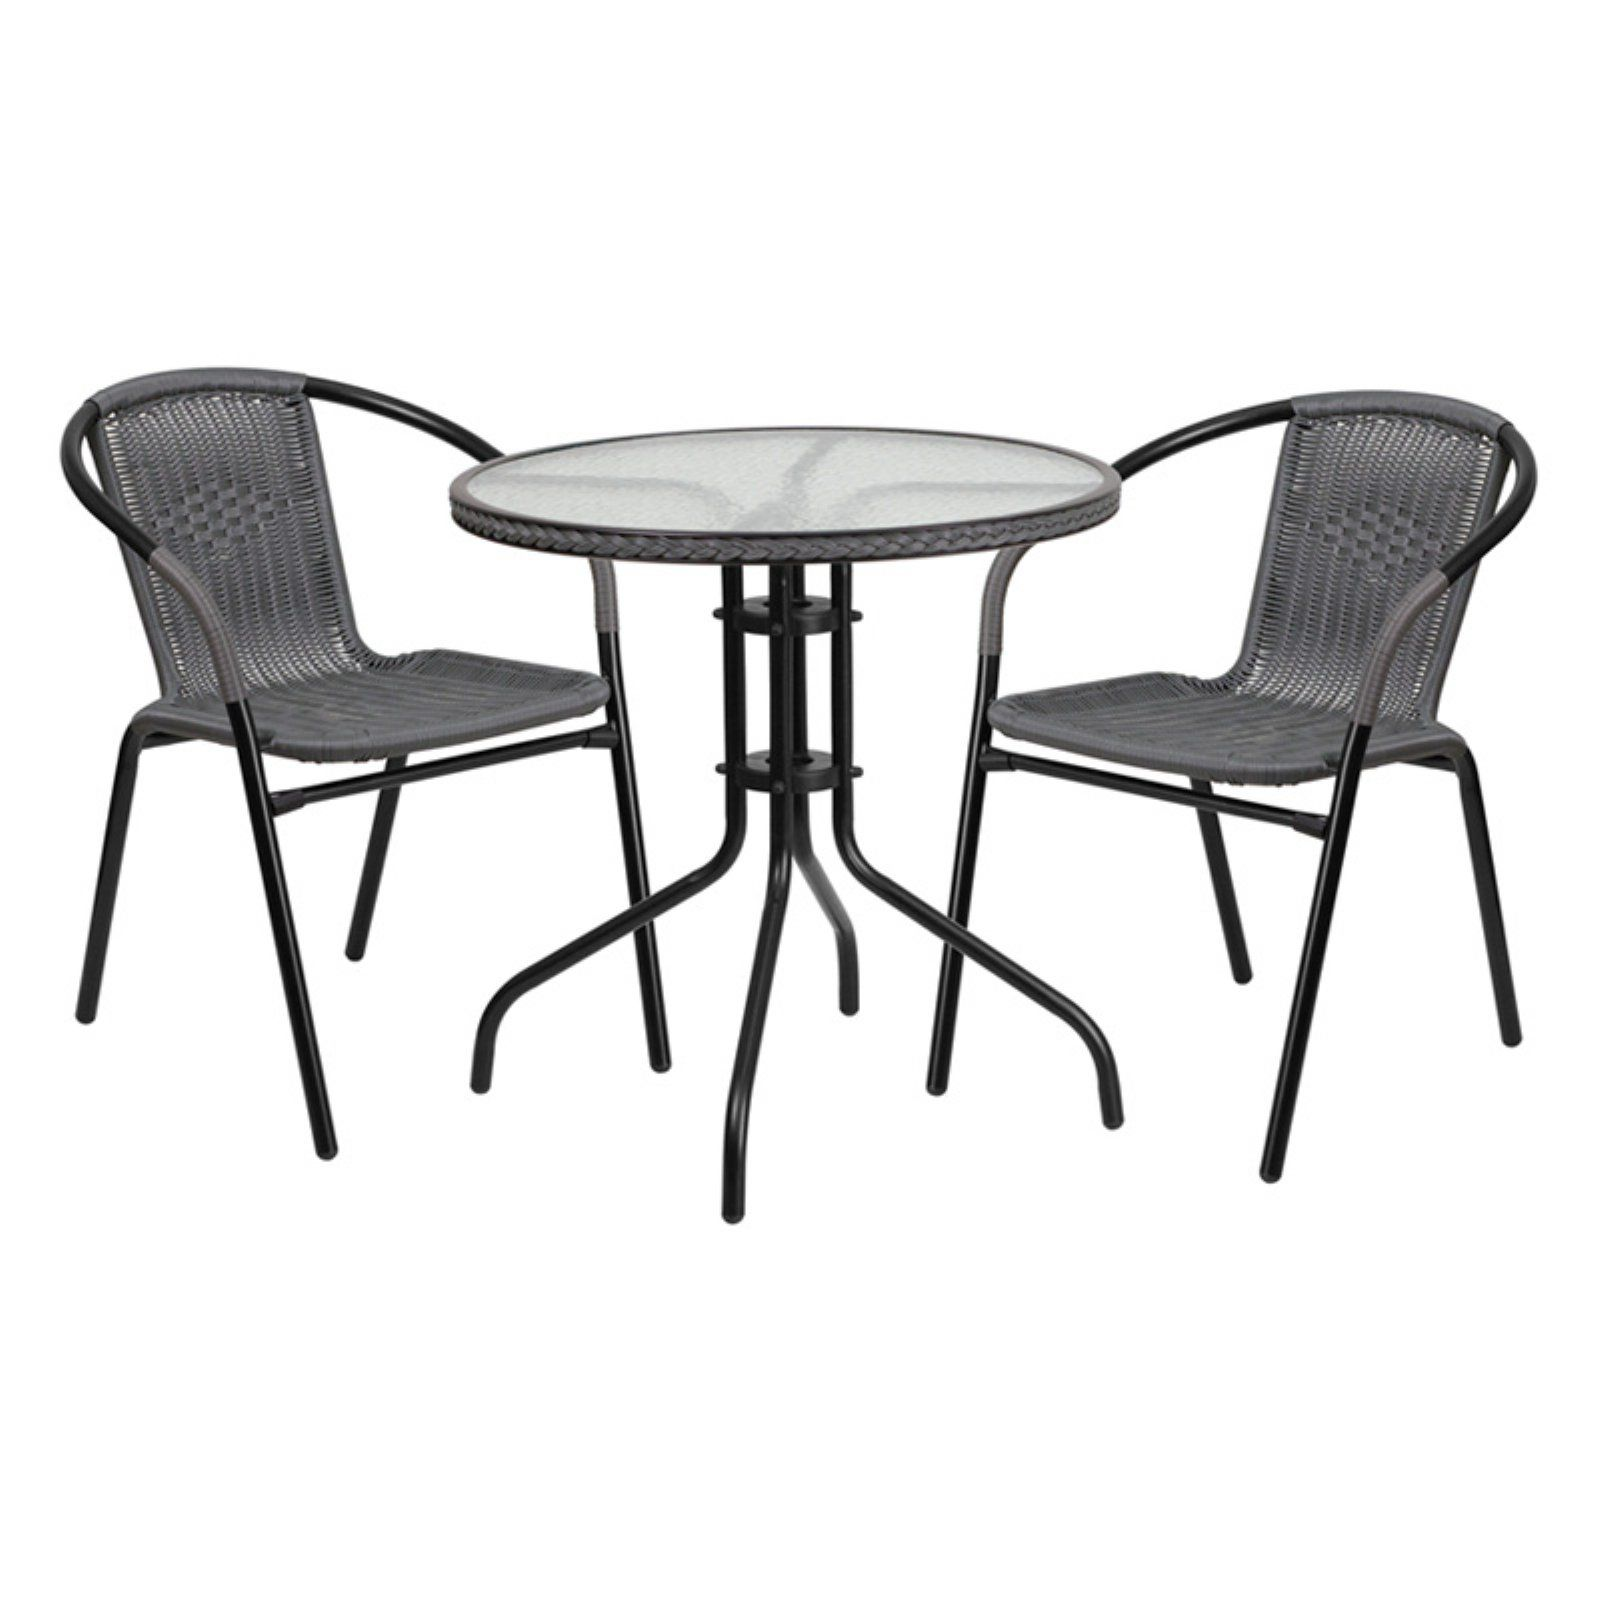 patio furniture sets patio decor